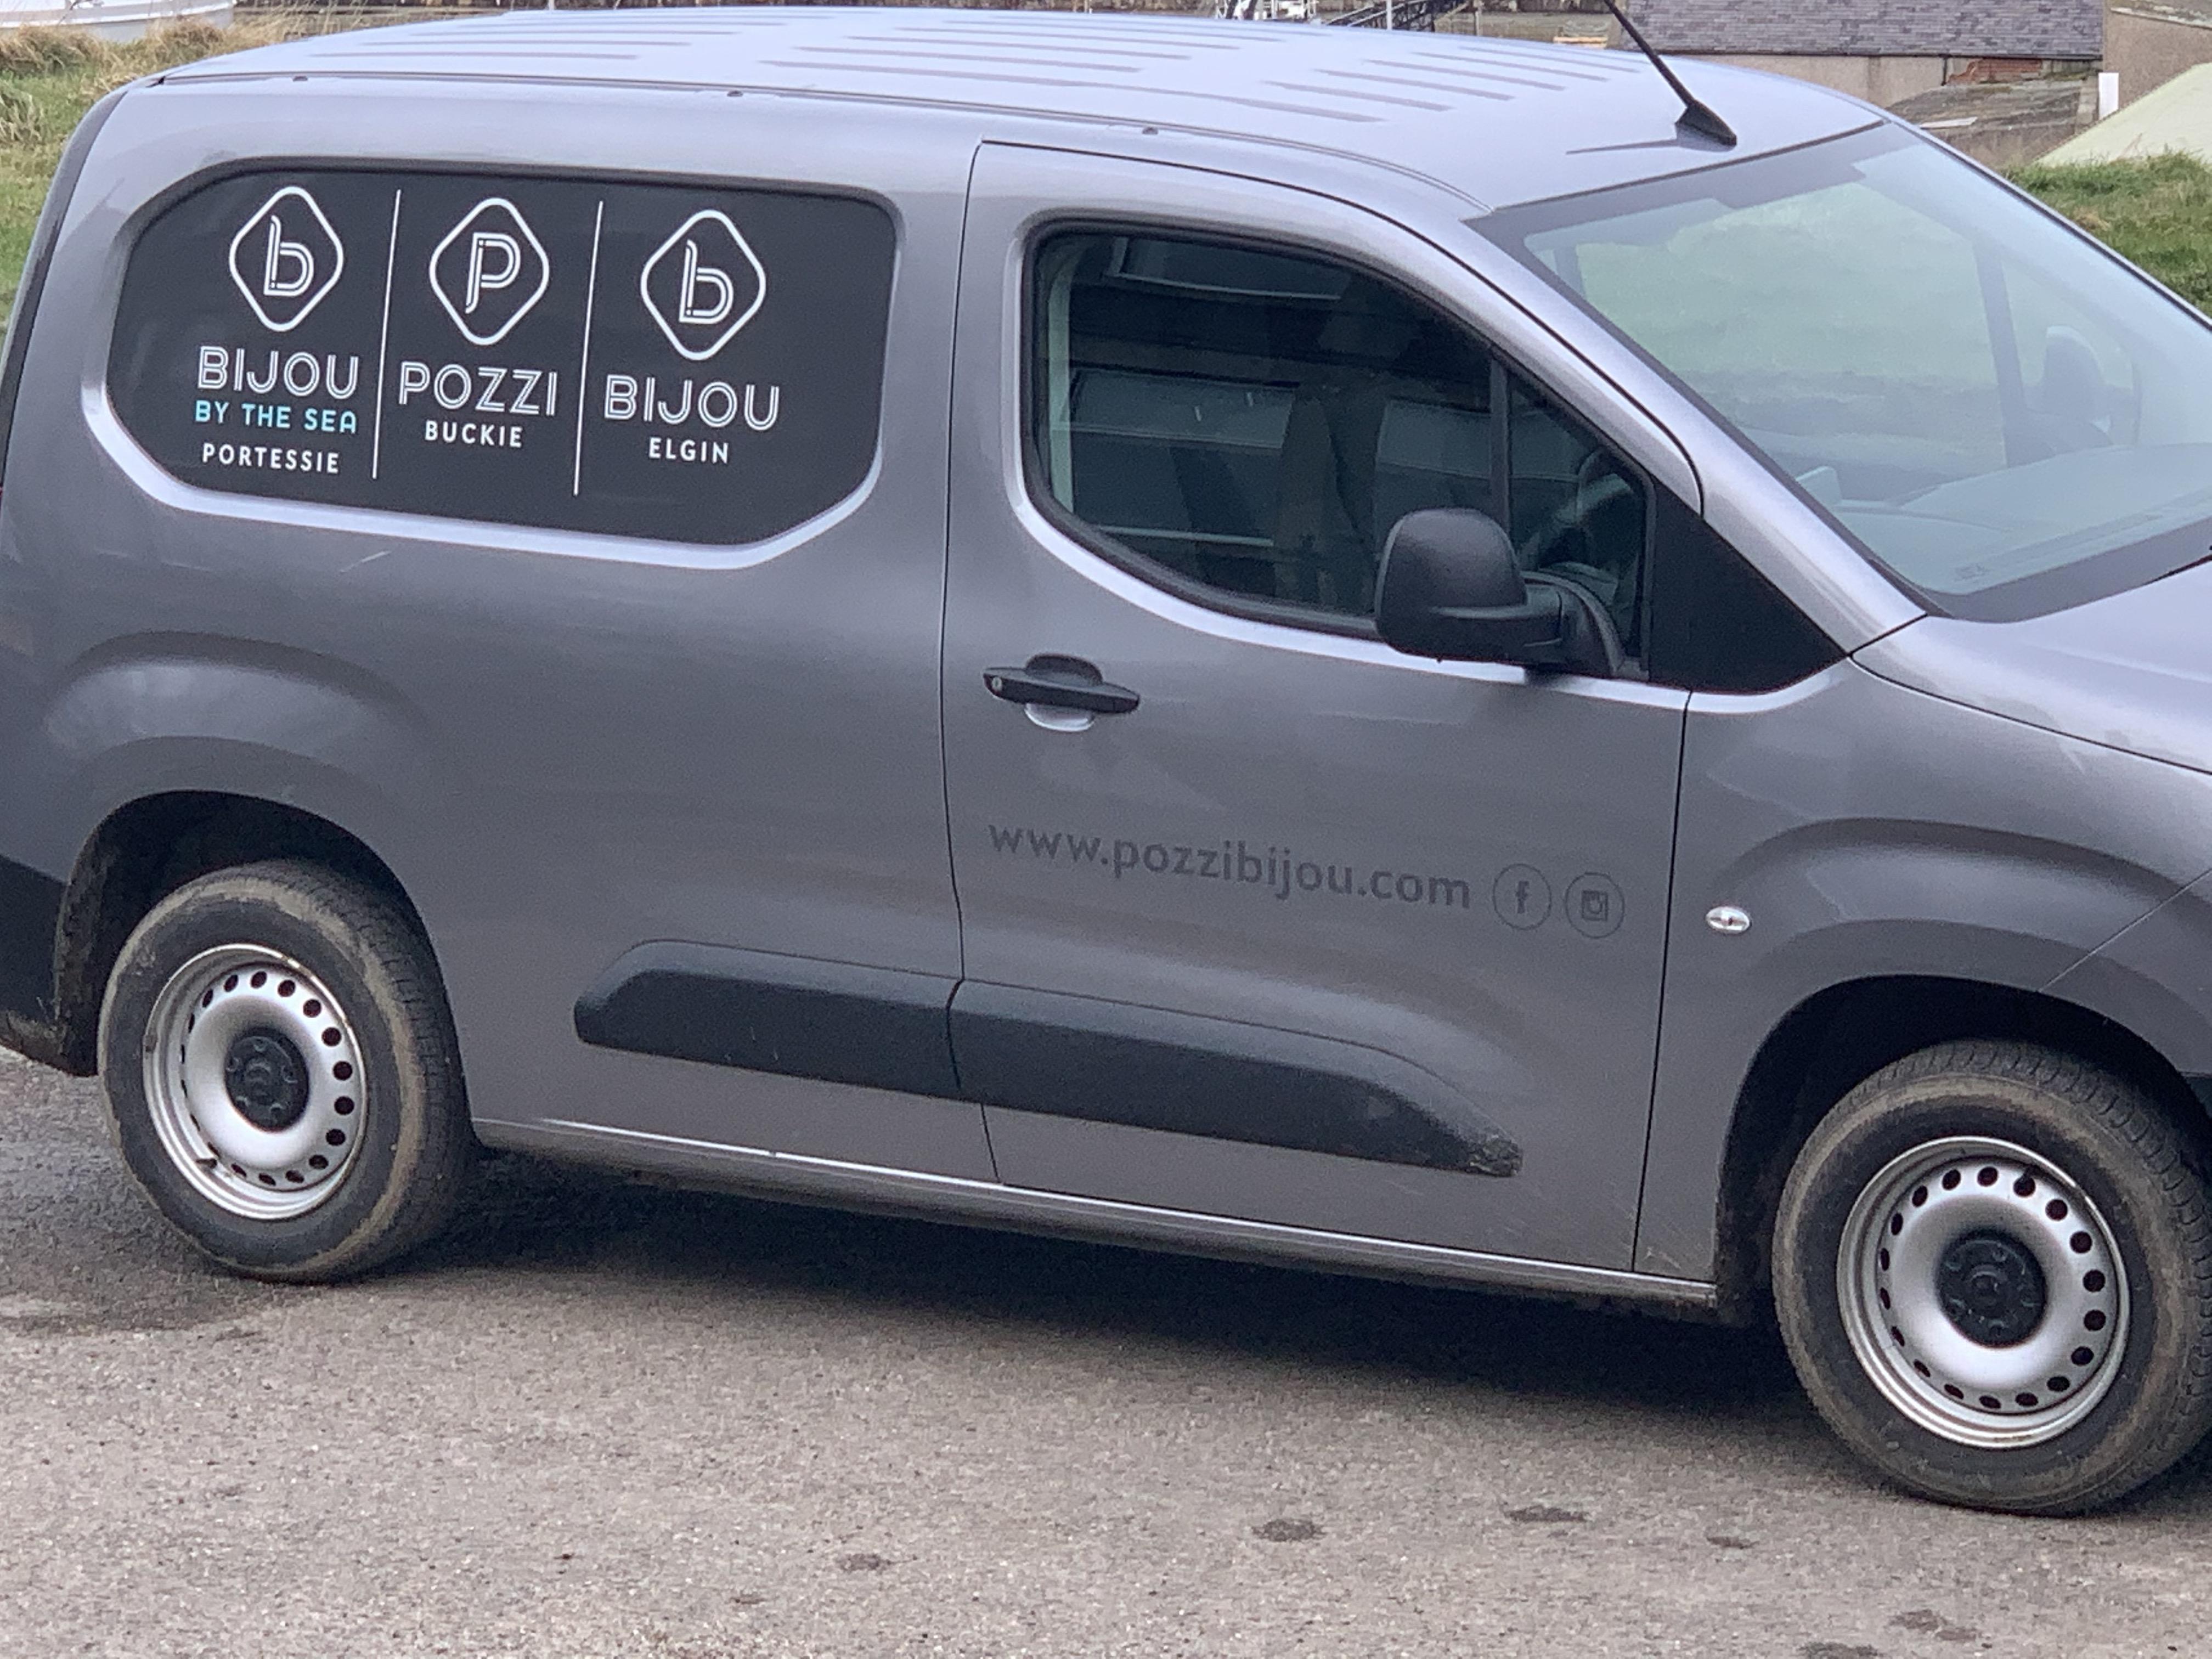 Above: Have van, will deliver!